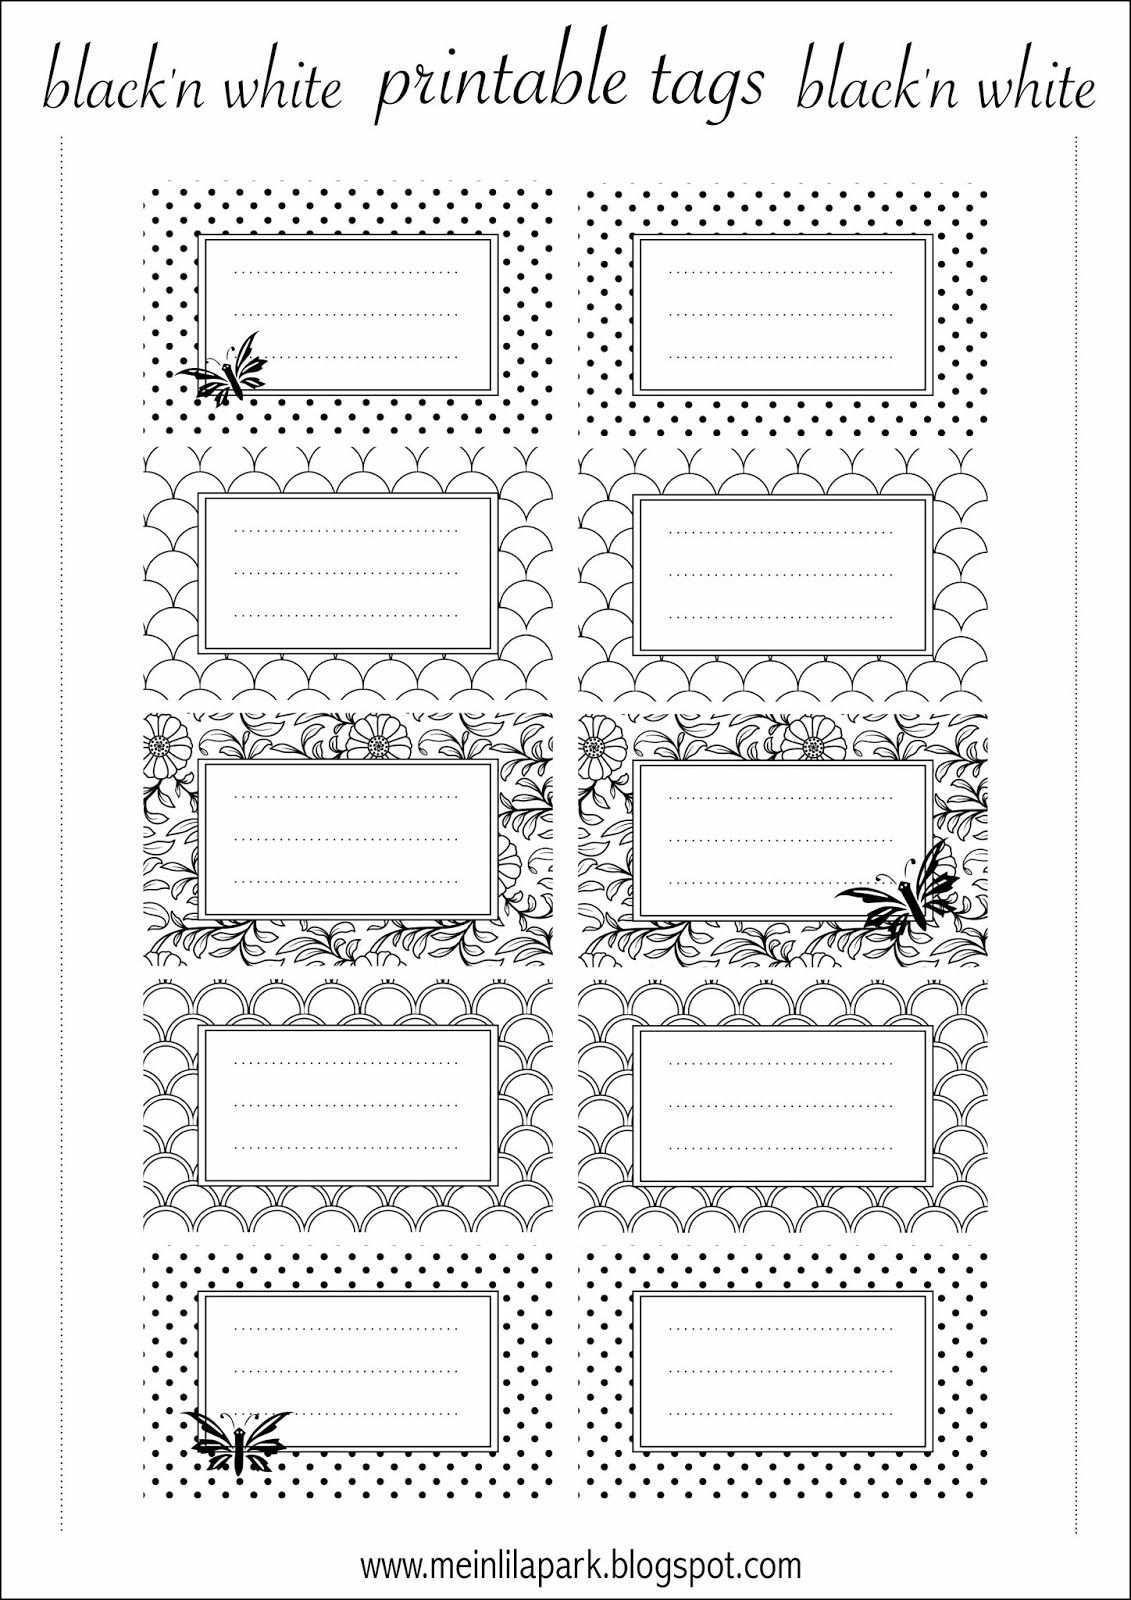 Free Printable Tags Black And White Ausdruckbare Etiketten Freebie Etiketten Selber Drucken Etiketten Drucken Etiketten Basteln